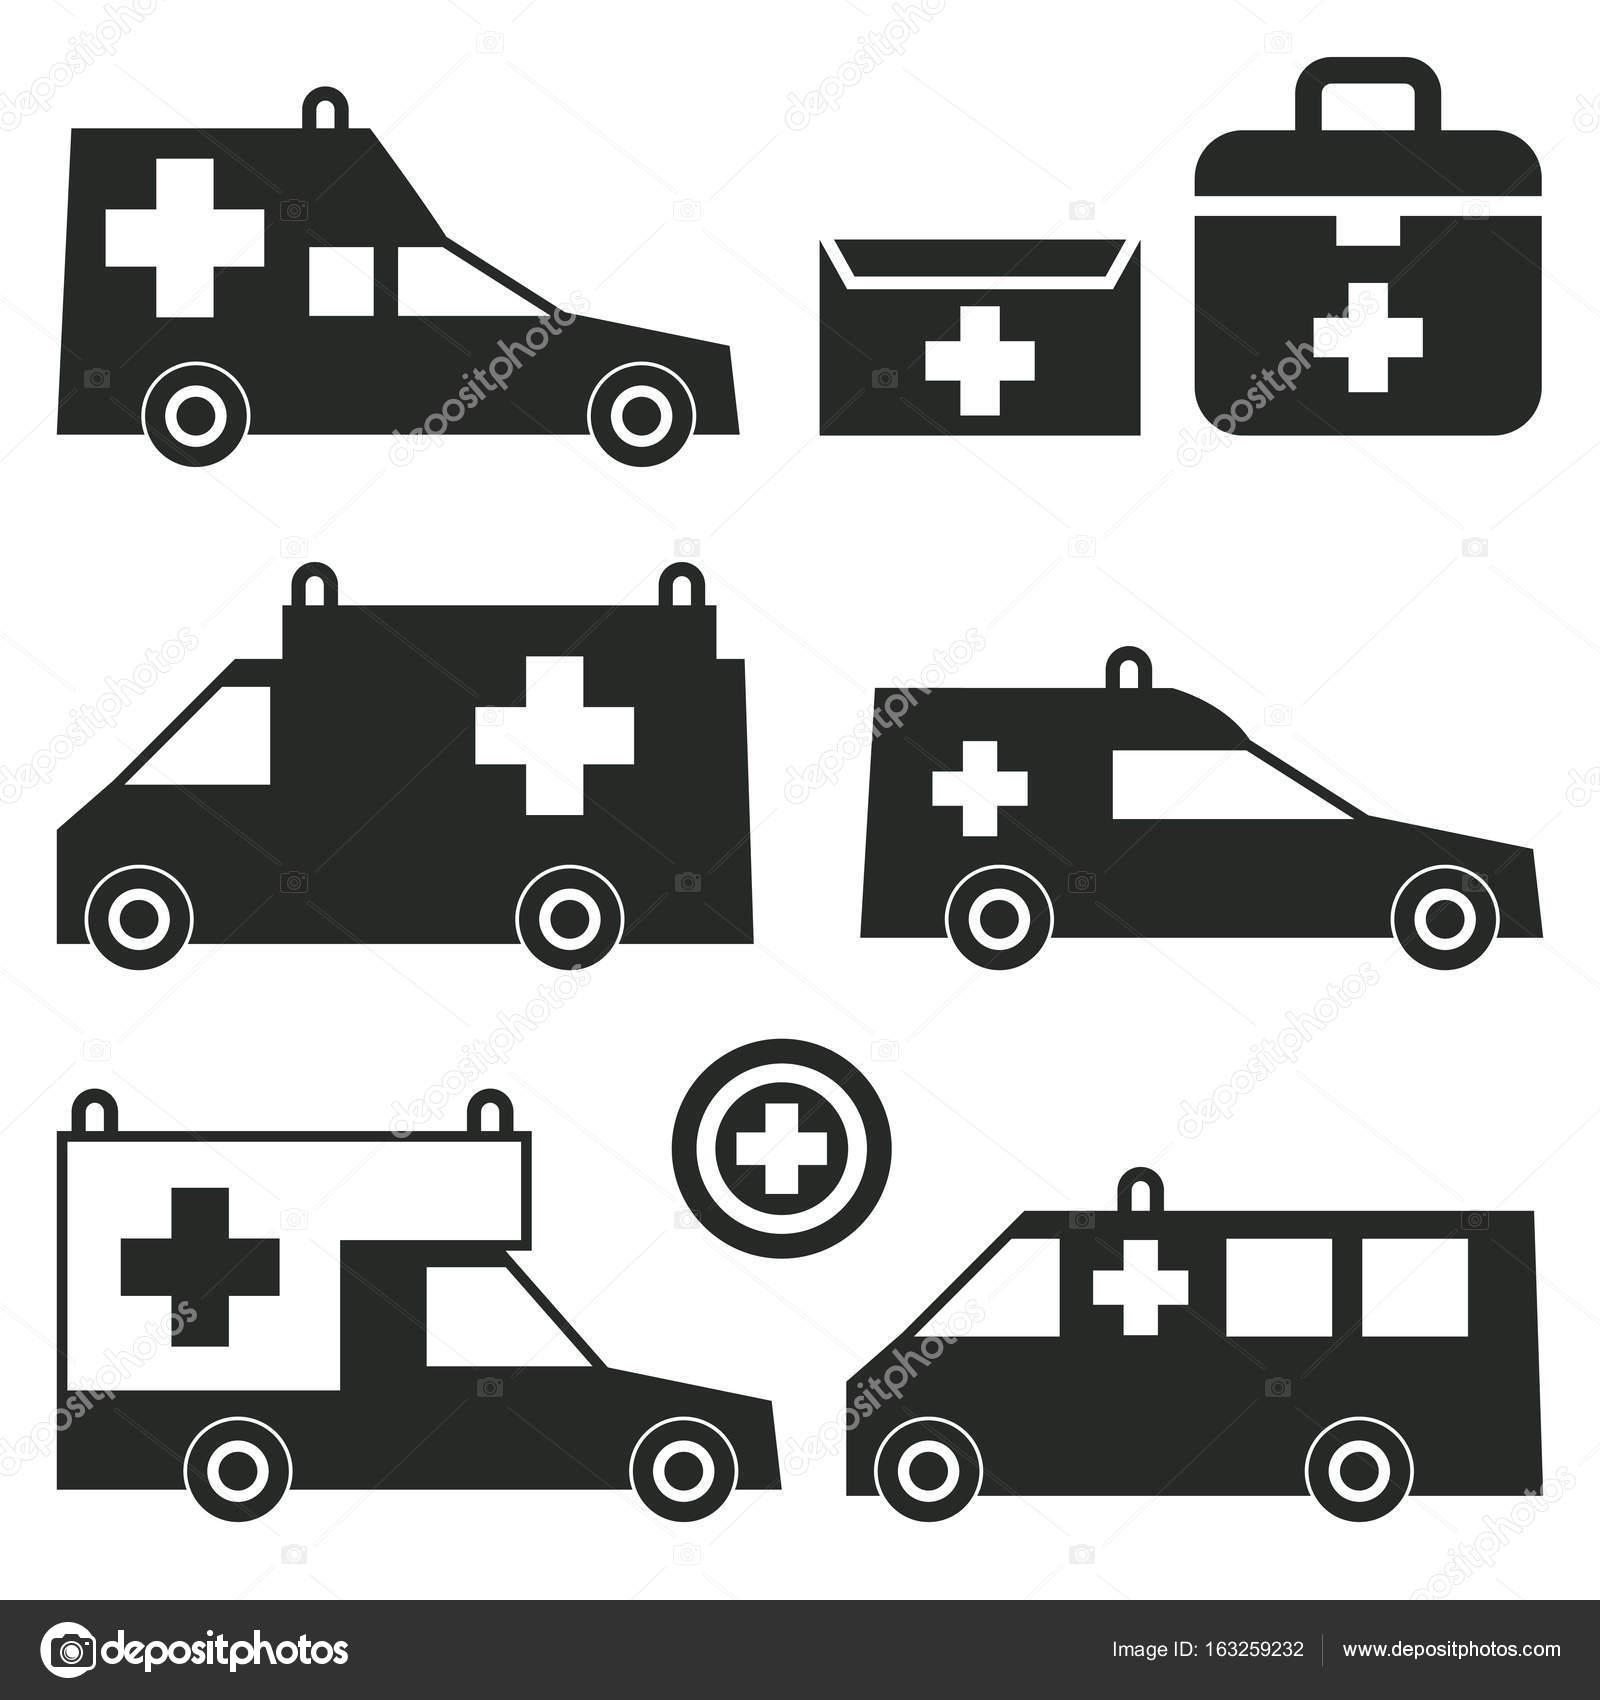 Ambulance Or Emergency Cars Signs Or Symbols Stock Vector Fla - Car signs and symbols